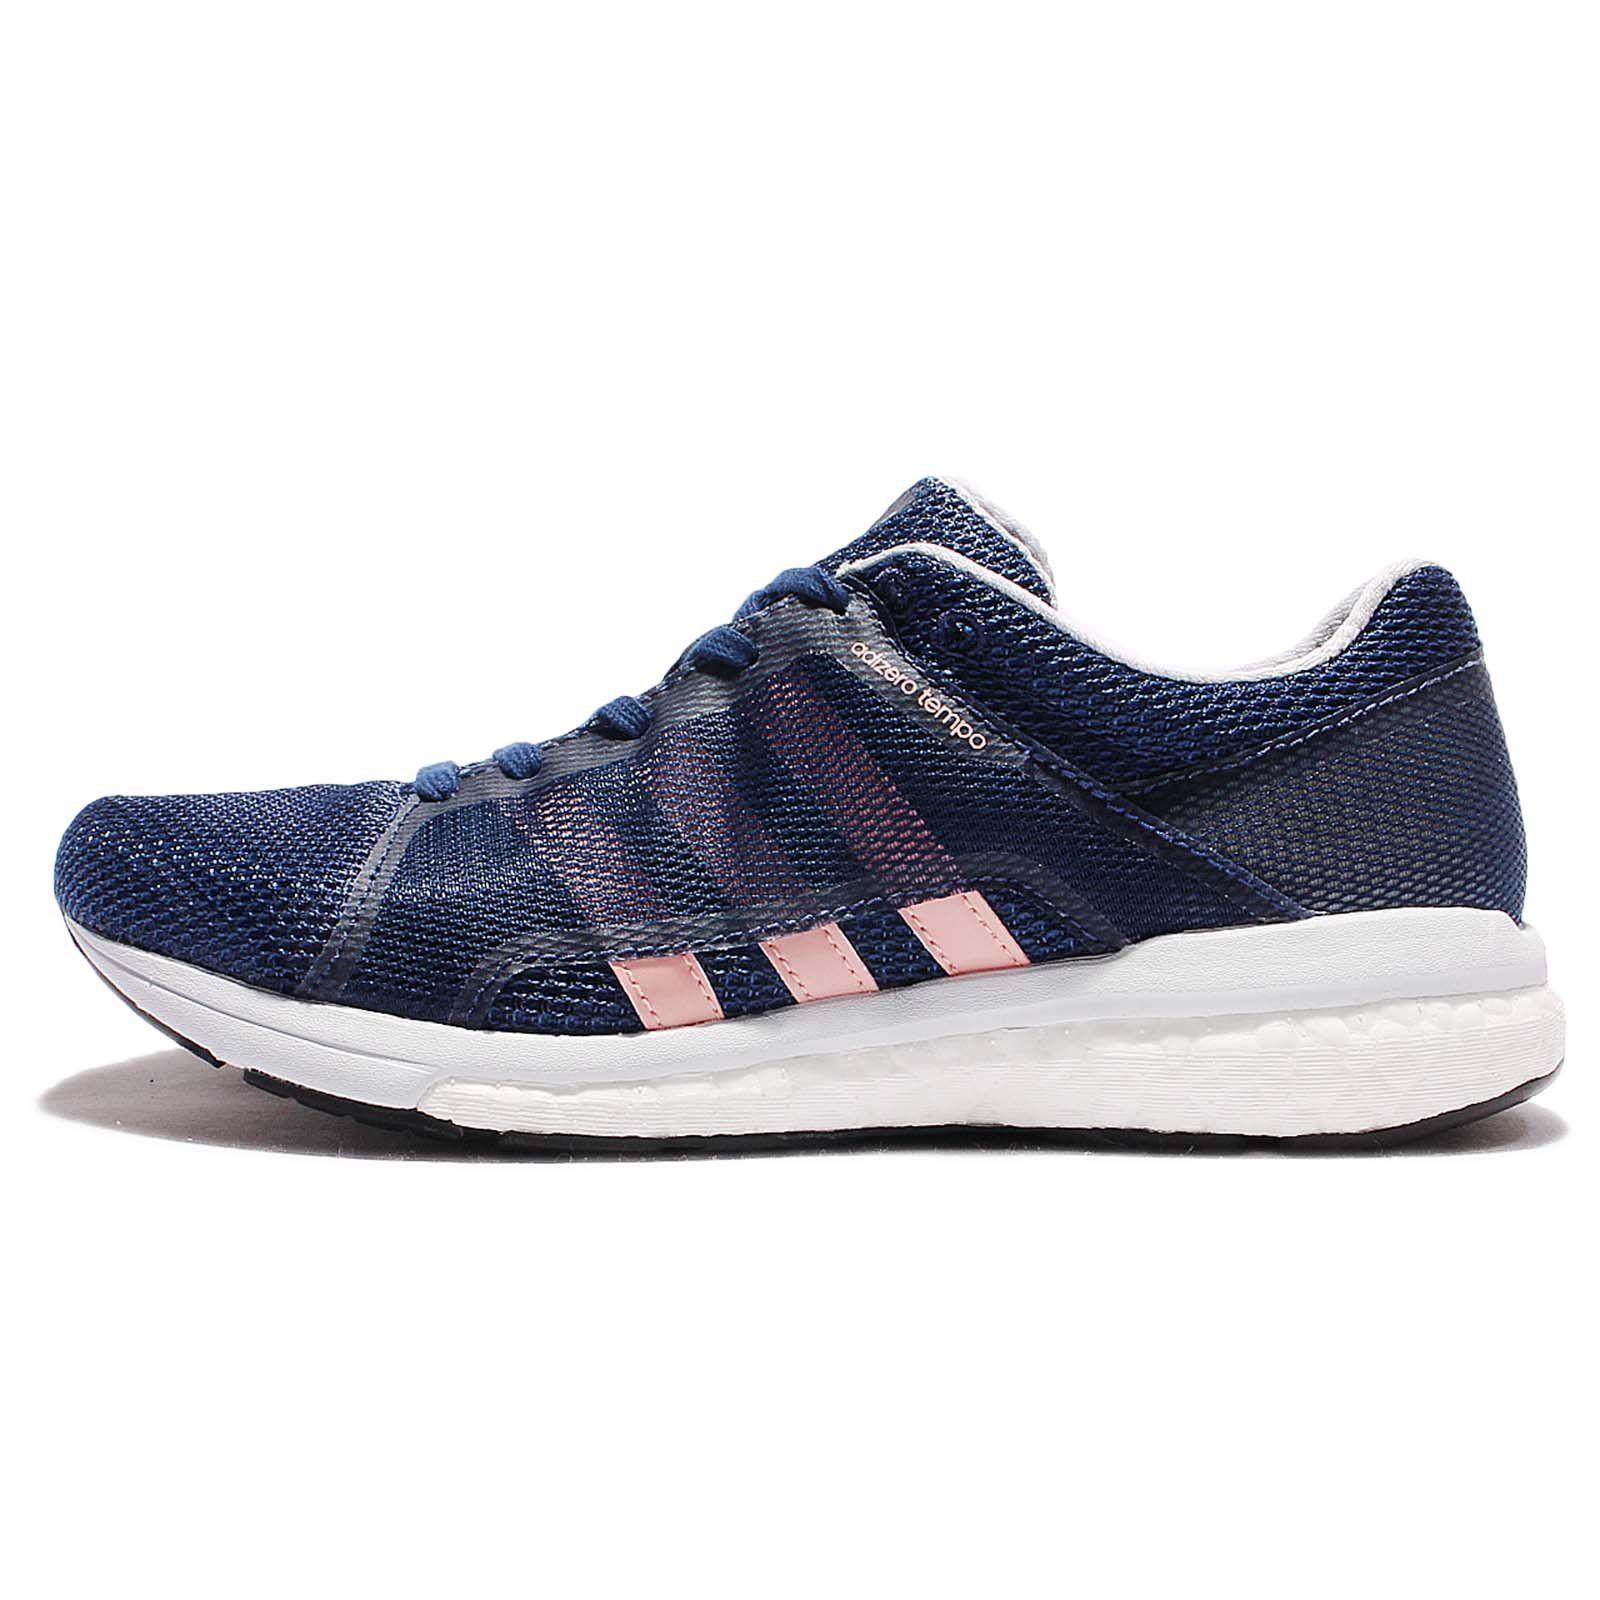 Adidas Adizero Tempo 8 SSF Women's Running Shoes - SS17 - 7.5 - Navy Blue.